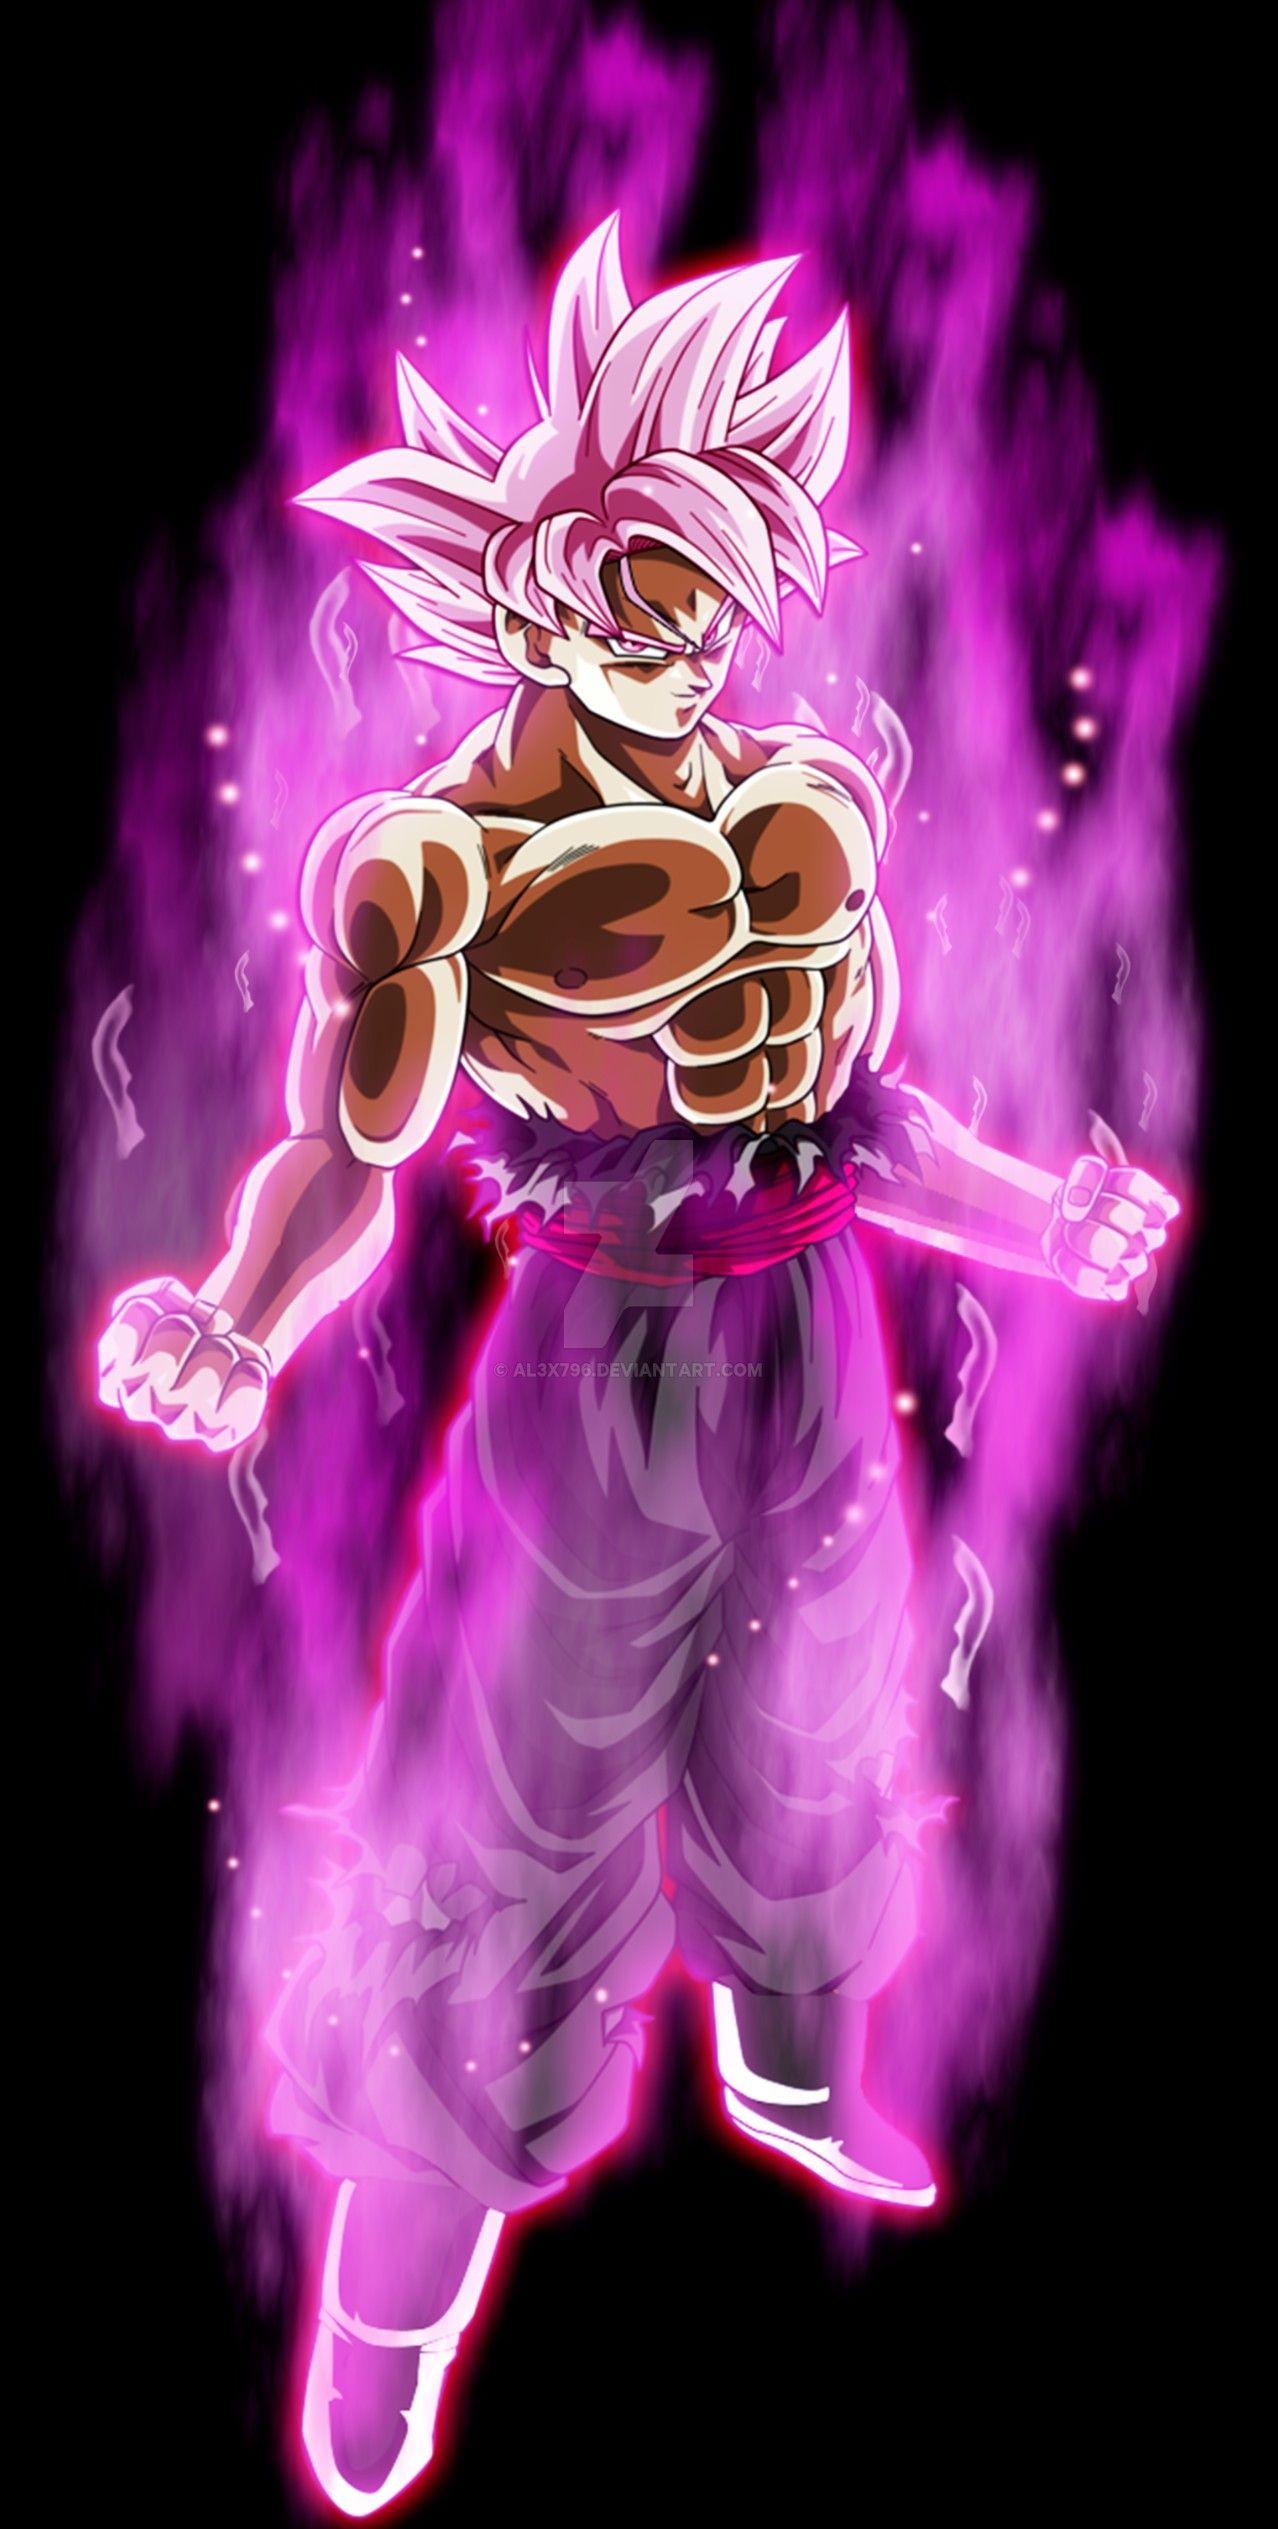 Goku Ultra Instinct Rose Dragon Ball Super Anime Dragon Ball Super Dragon Ball Super Art Dragon Ball Super Goku